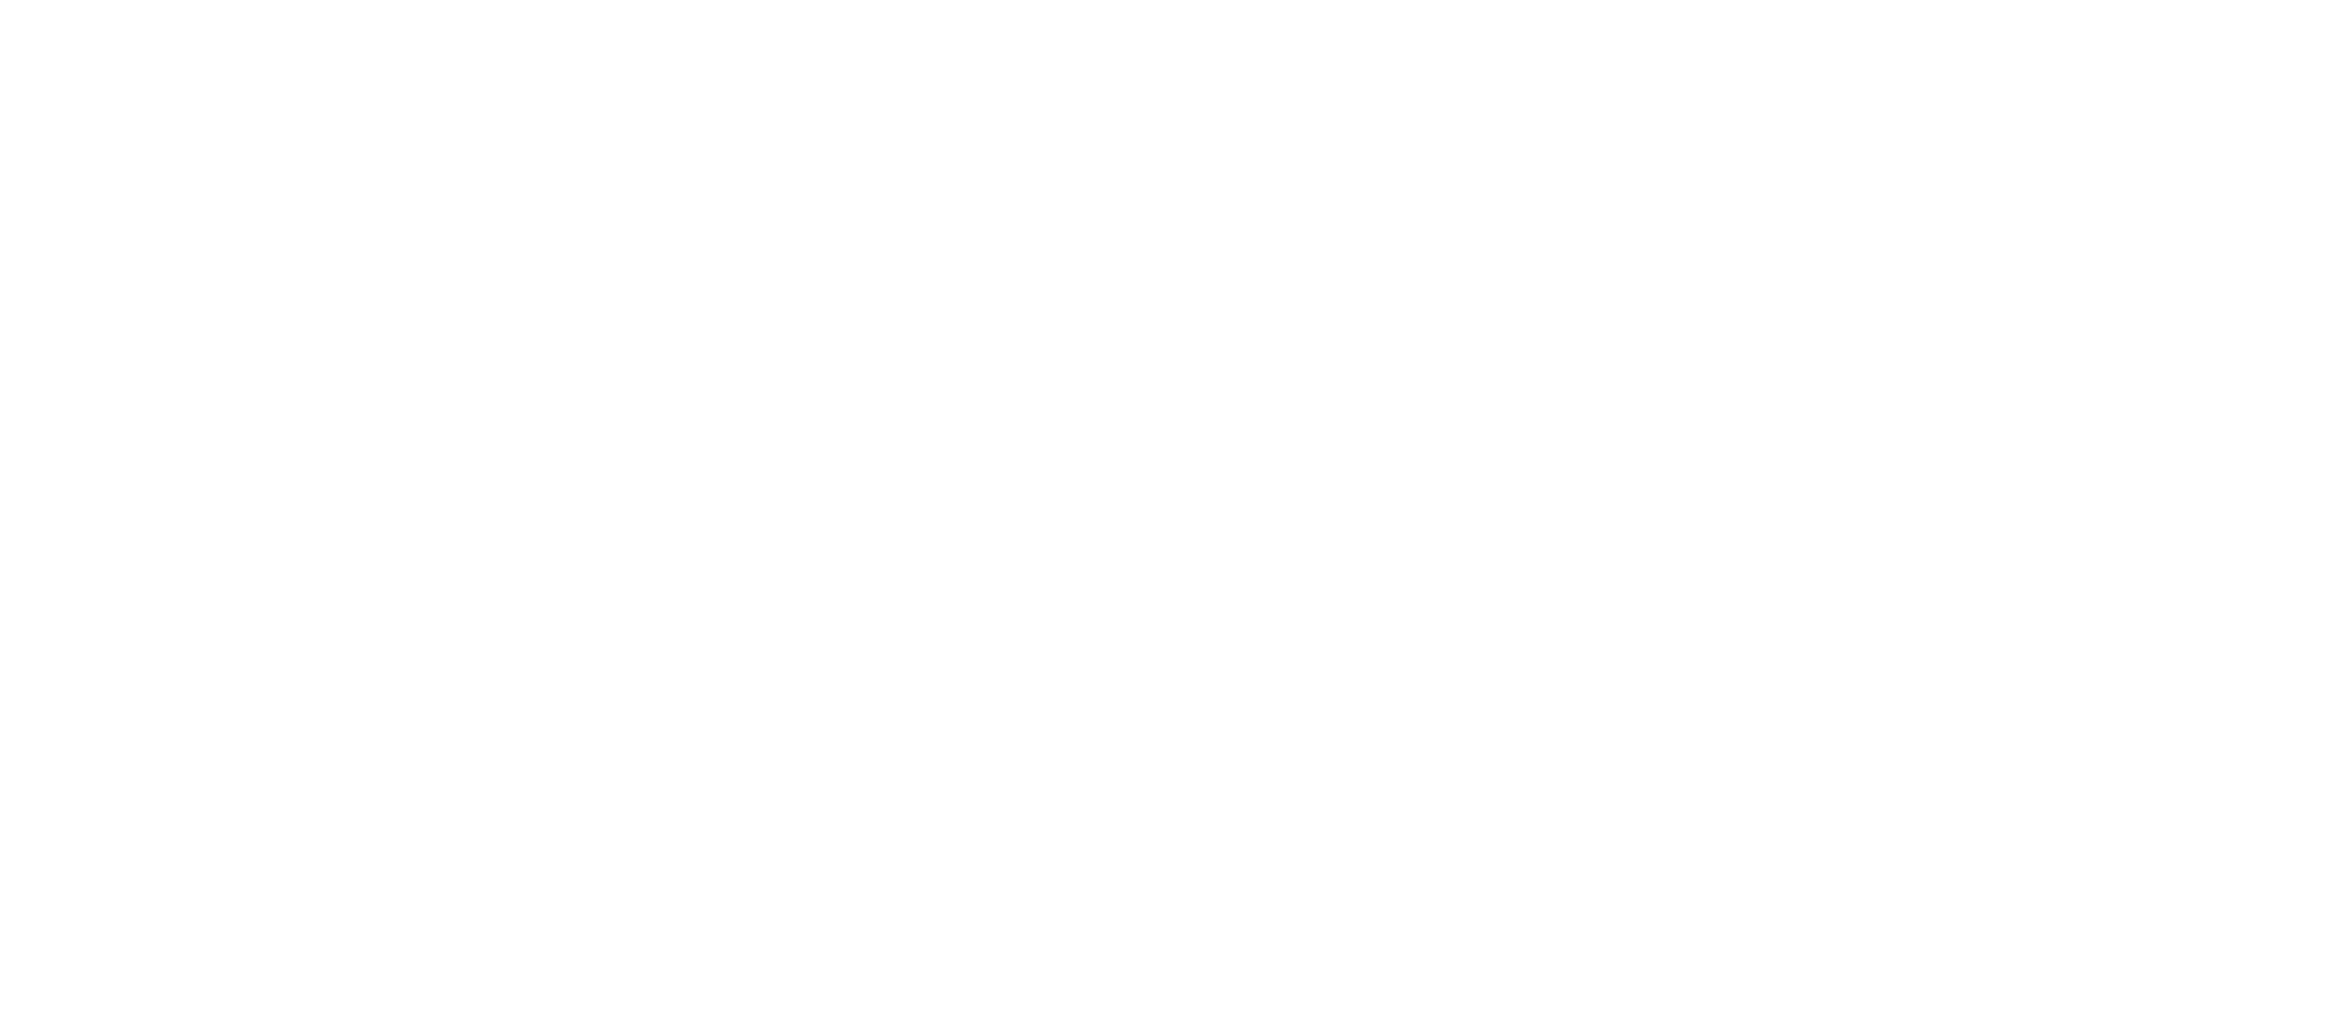 Flyer View Group logo White